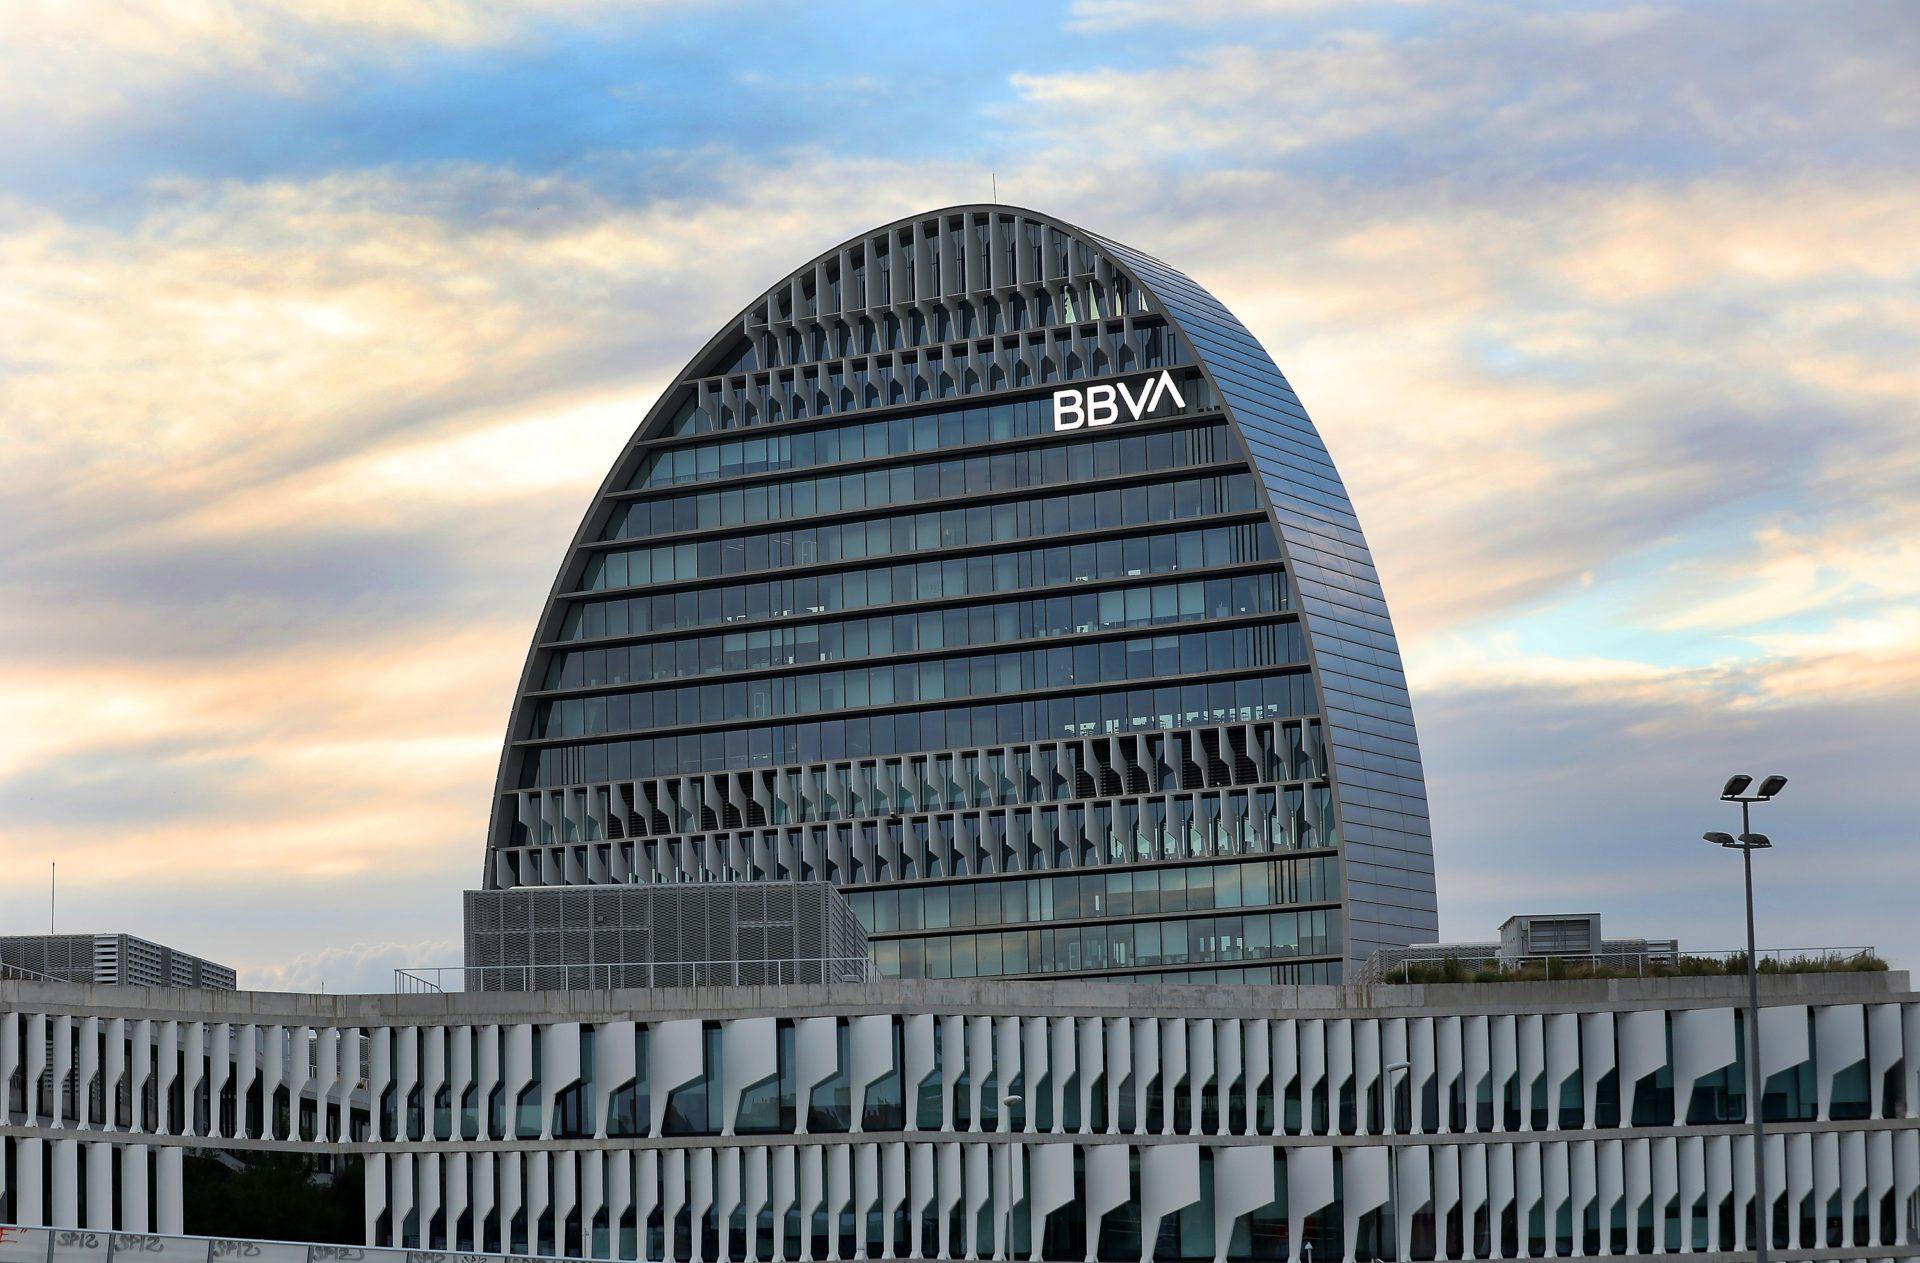 https://accionistaseinversores.bbva.com/wp-content/uploads/2019/07/foto-vela-ciudad-bbva-logo-nuevo-1920x1263.jpg